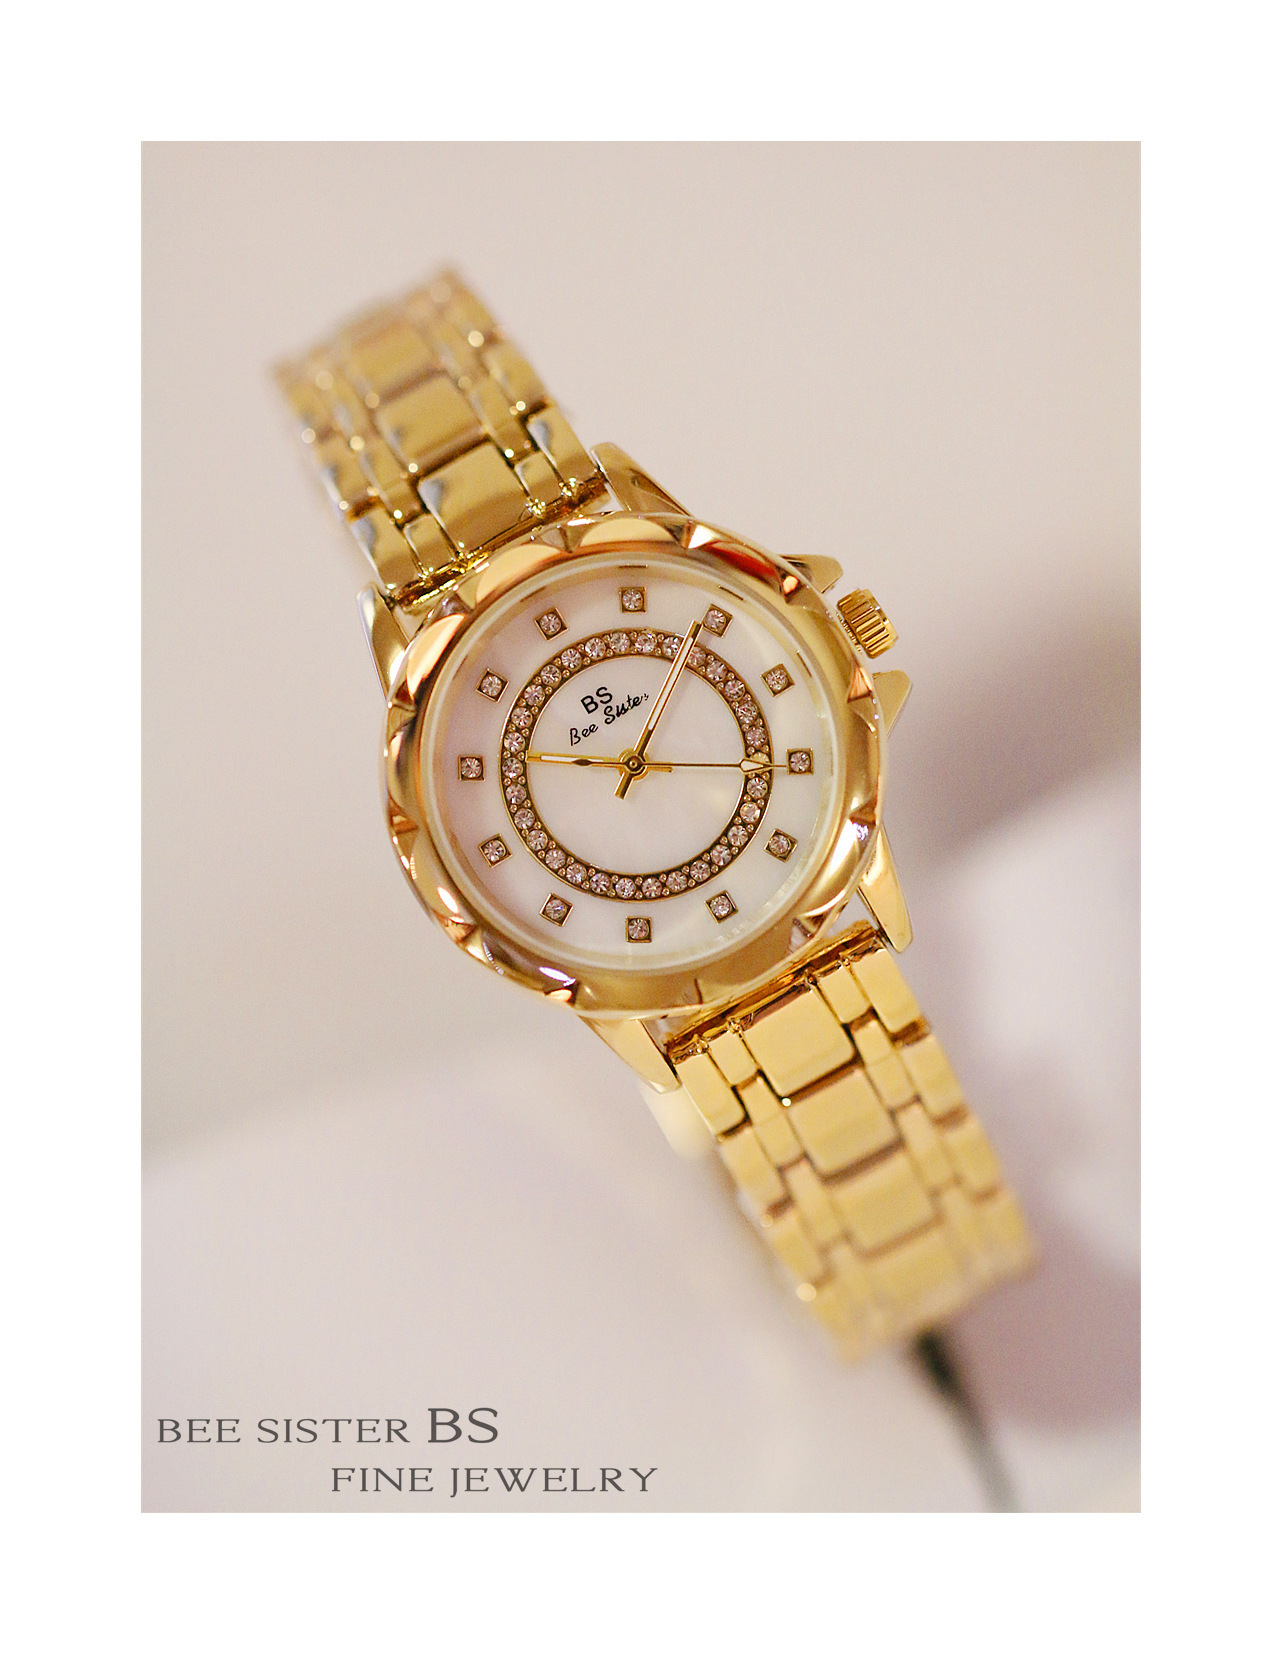 Senhoras high-end simples pulseira relógio de moda